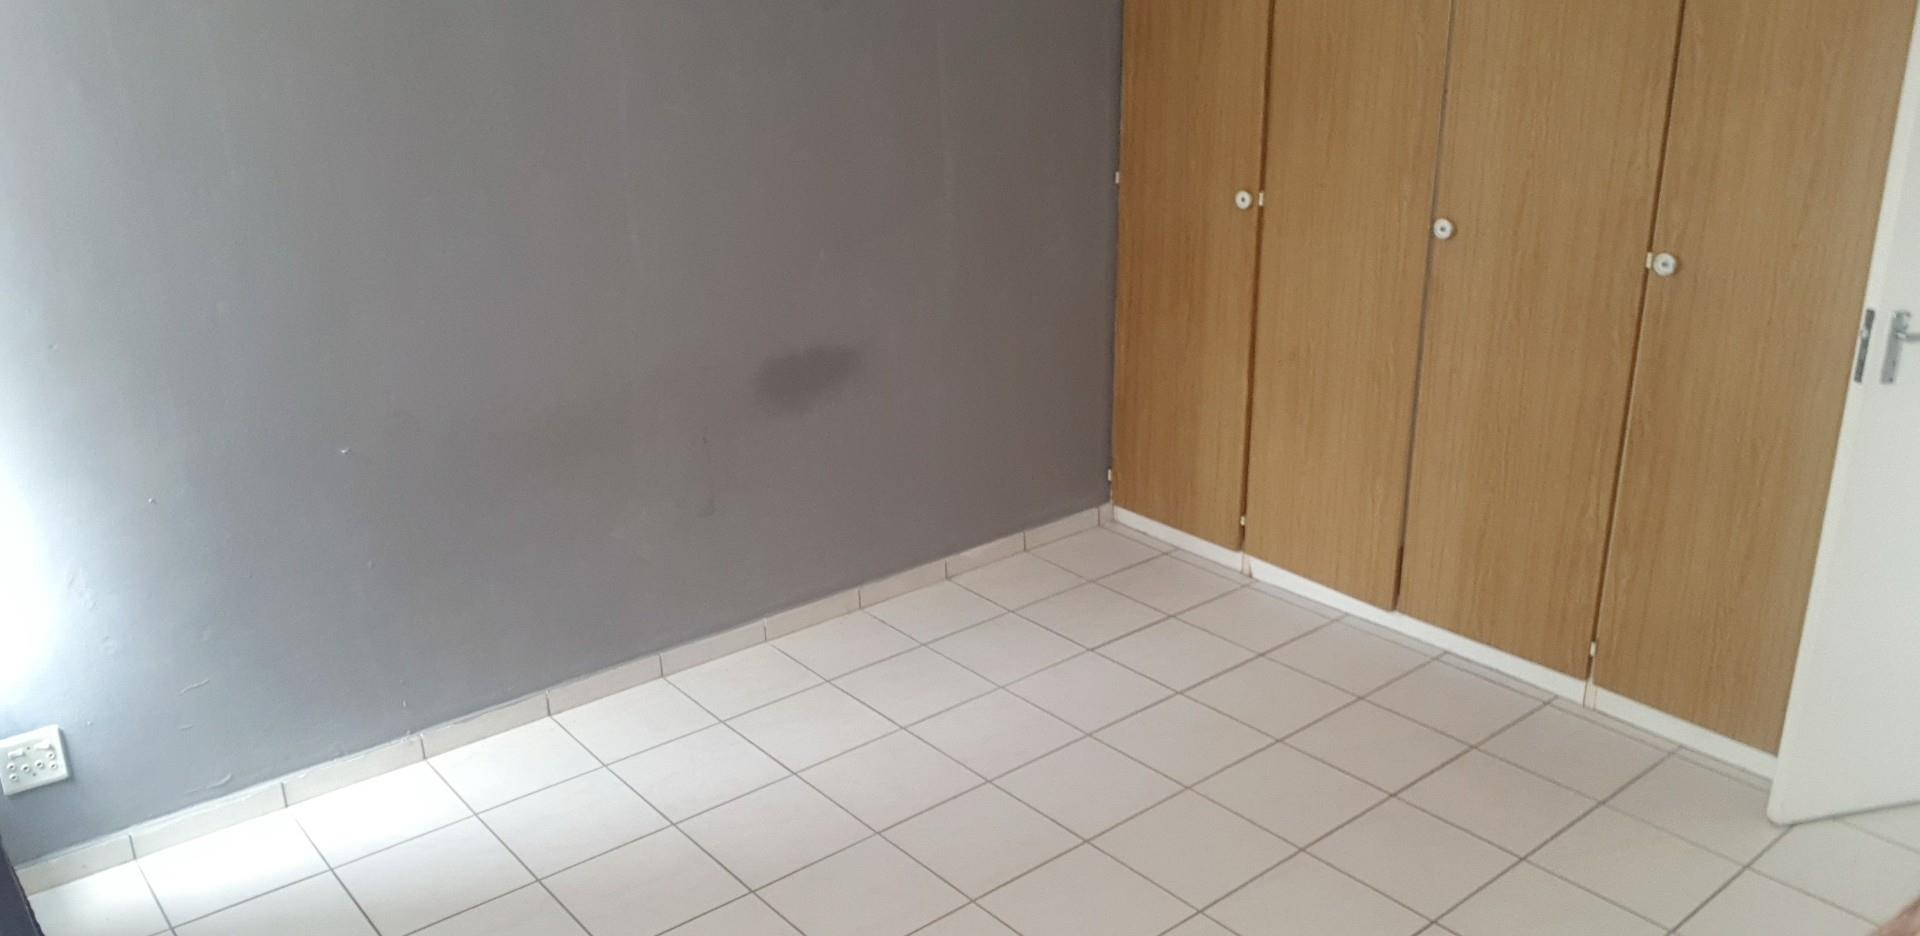 2 Bedroom Apartment / Flat For Sale in Elandshaven